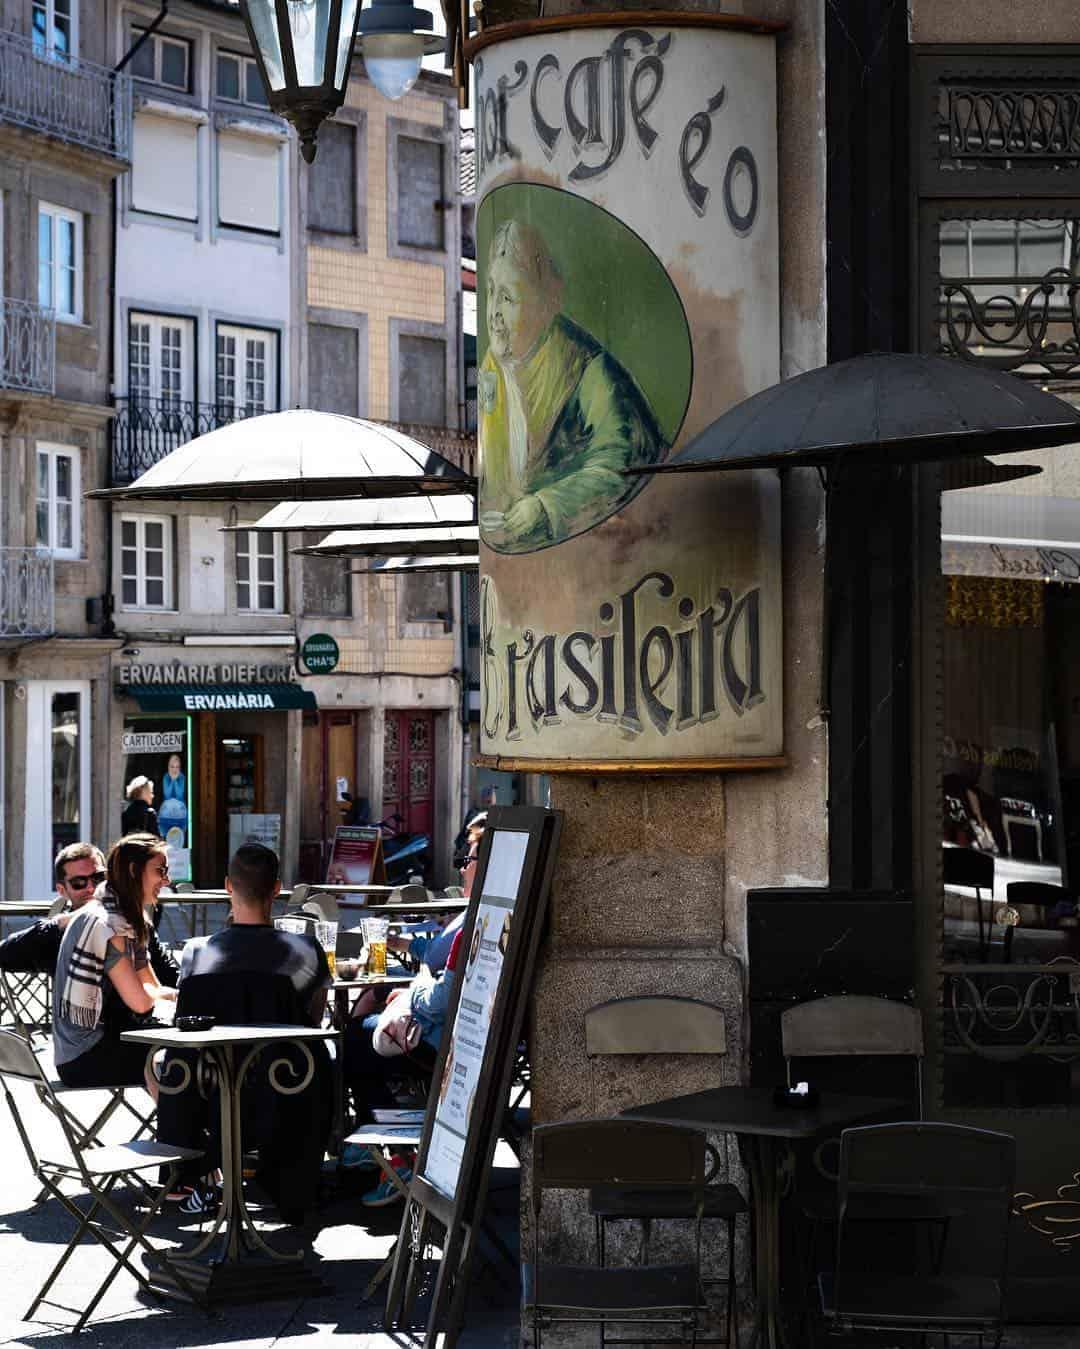 Cafe a Brasileira de Braga, Portugal